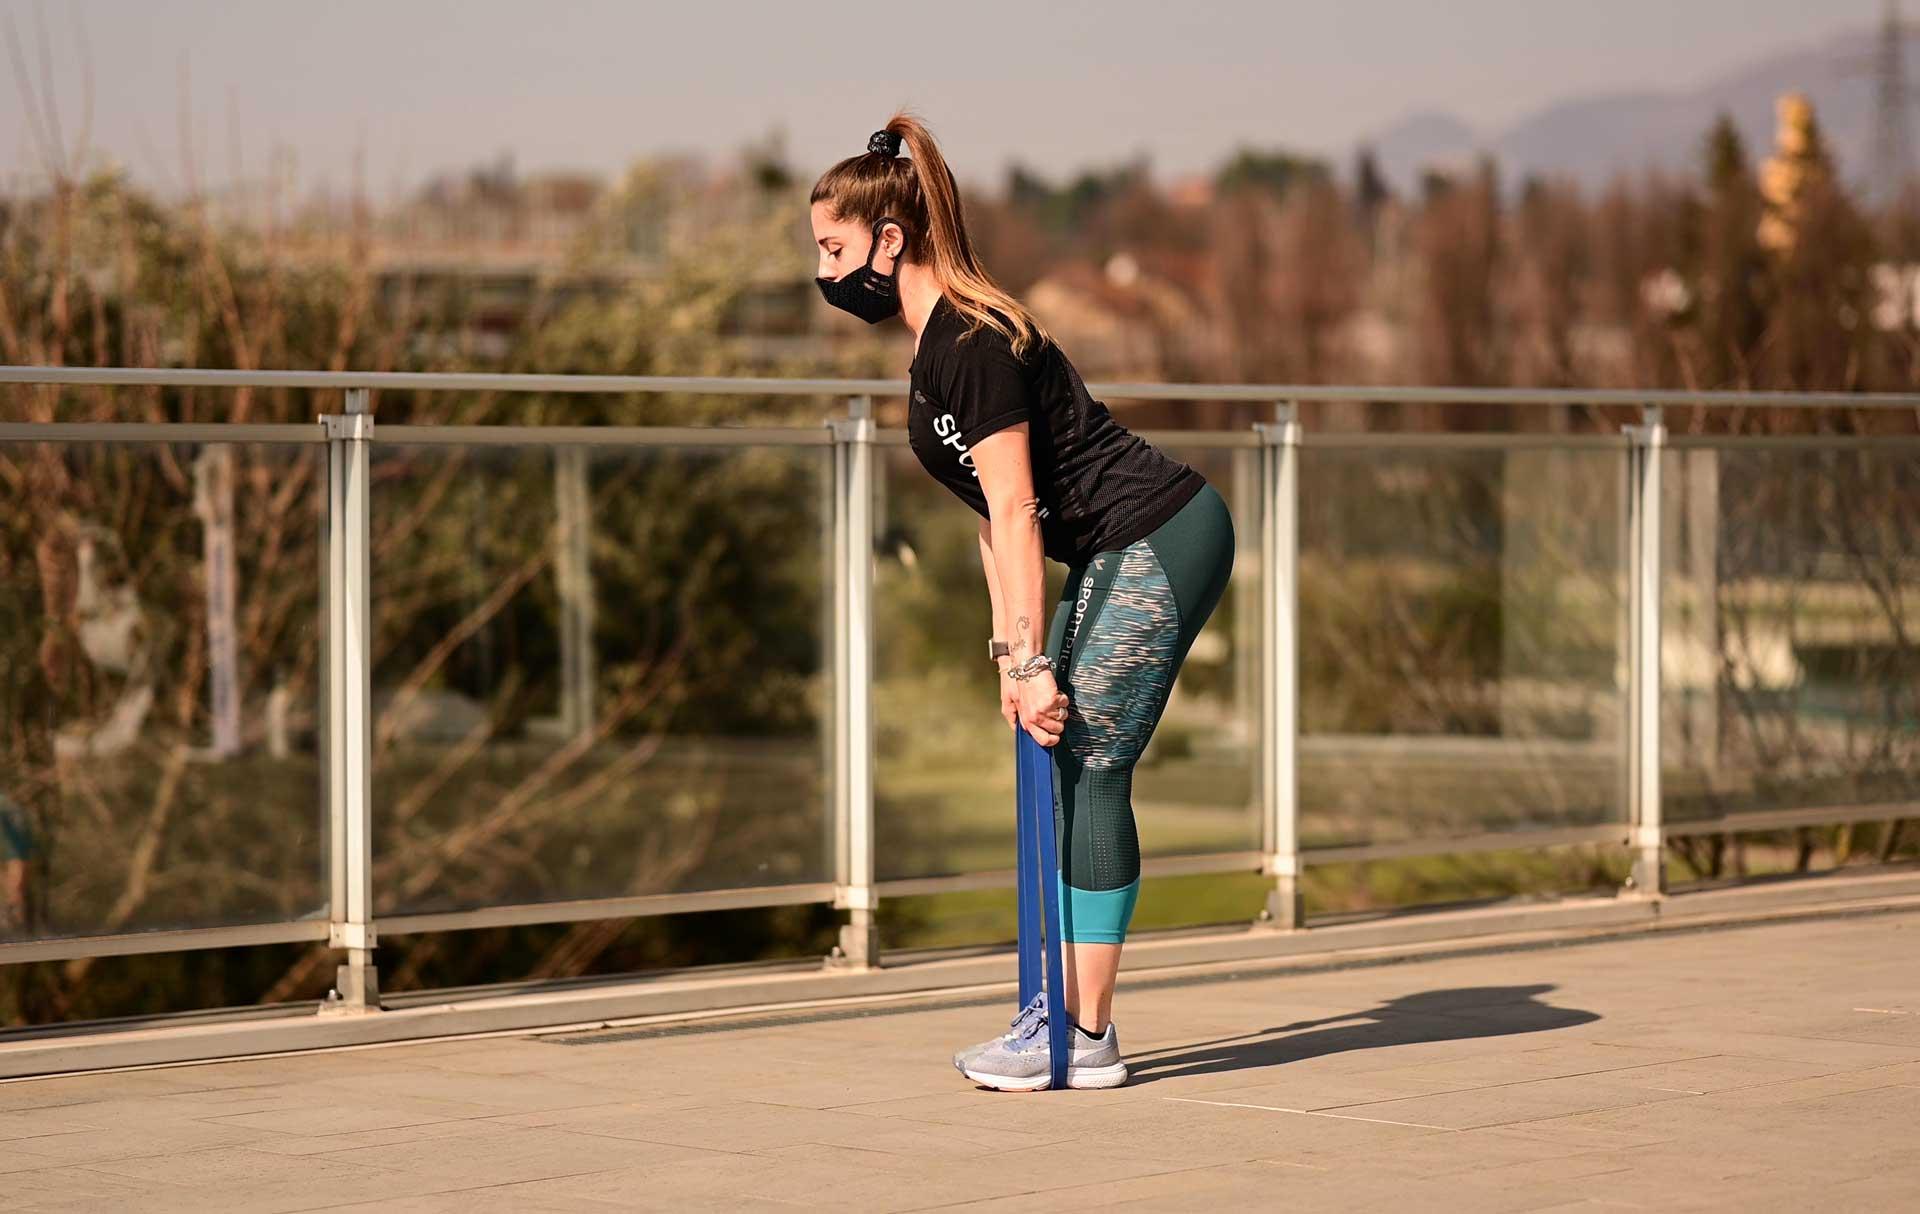 Elastico blu ragazza esercizio